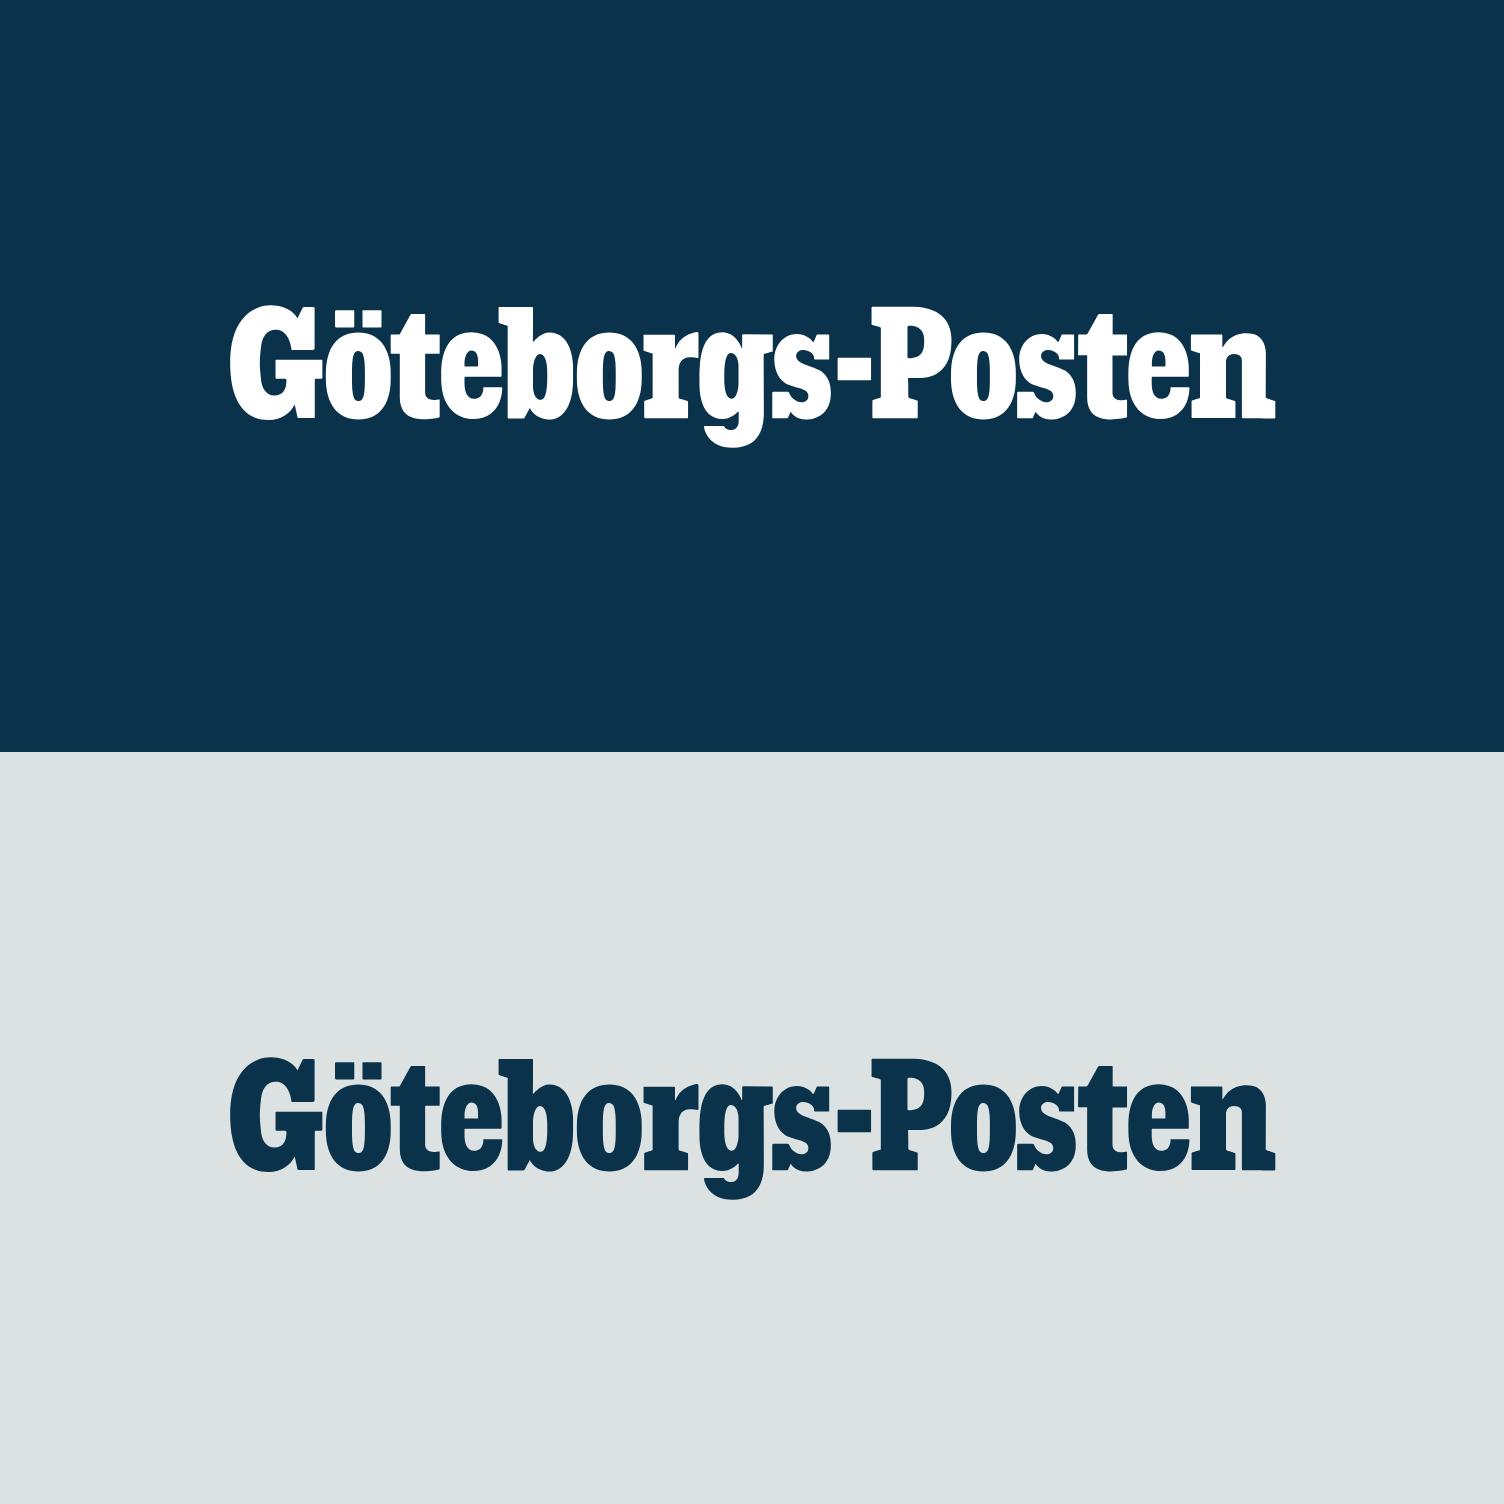 1571399215 brandworkgoteborgs posten1 2x